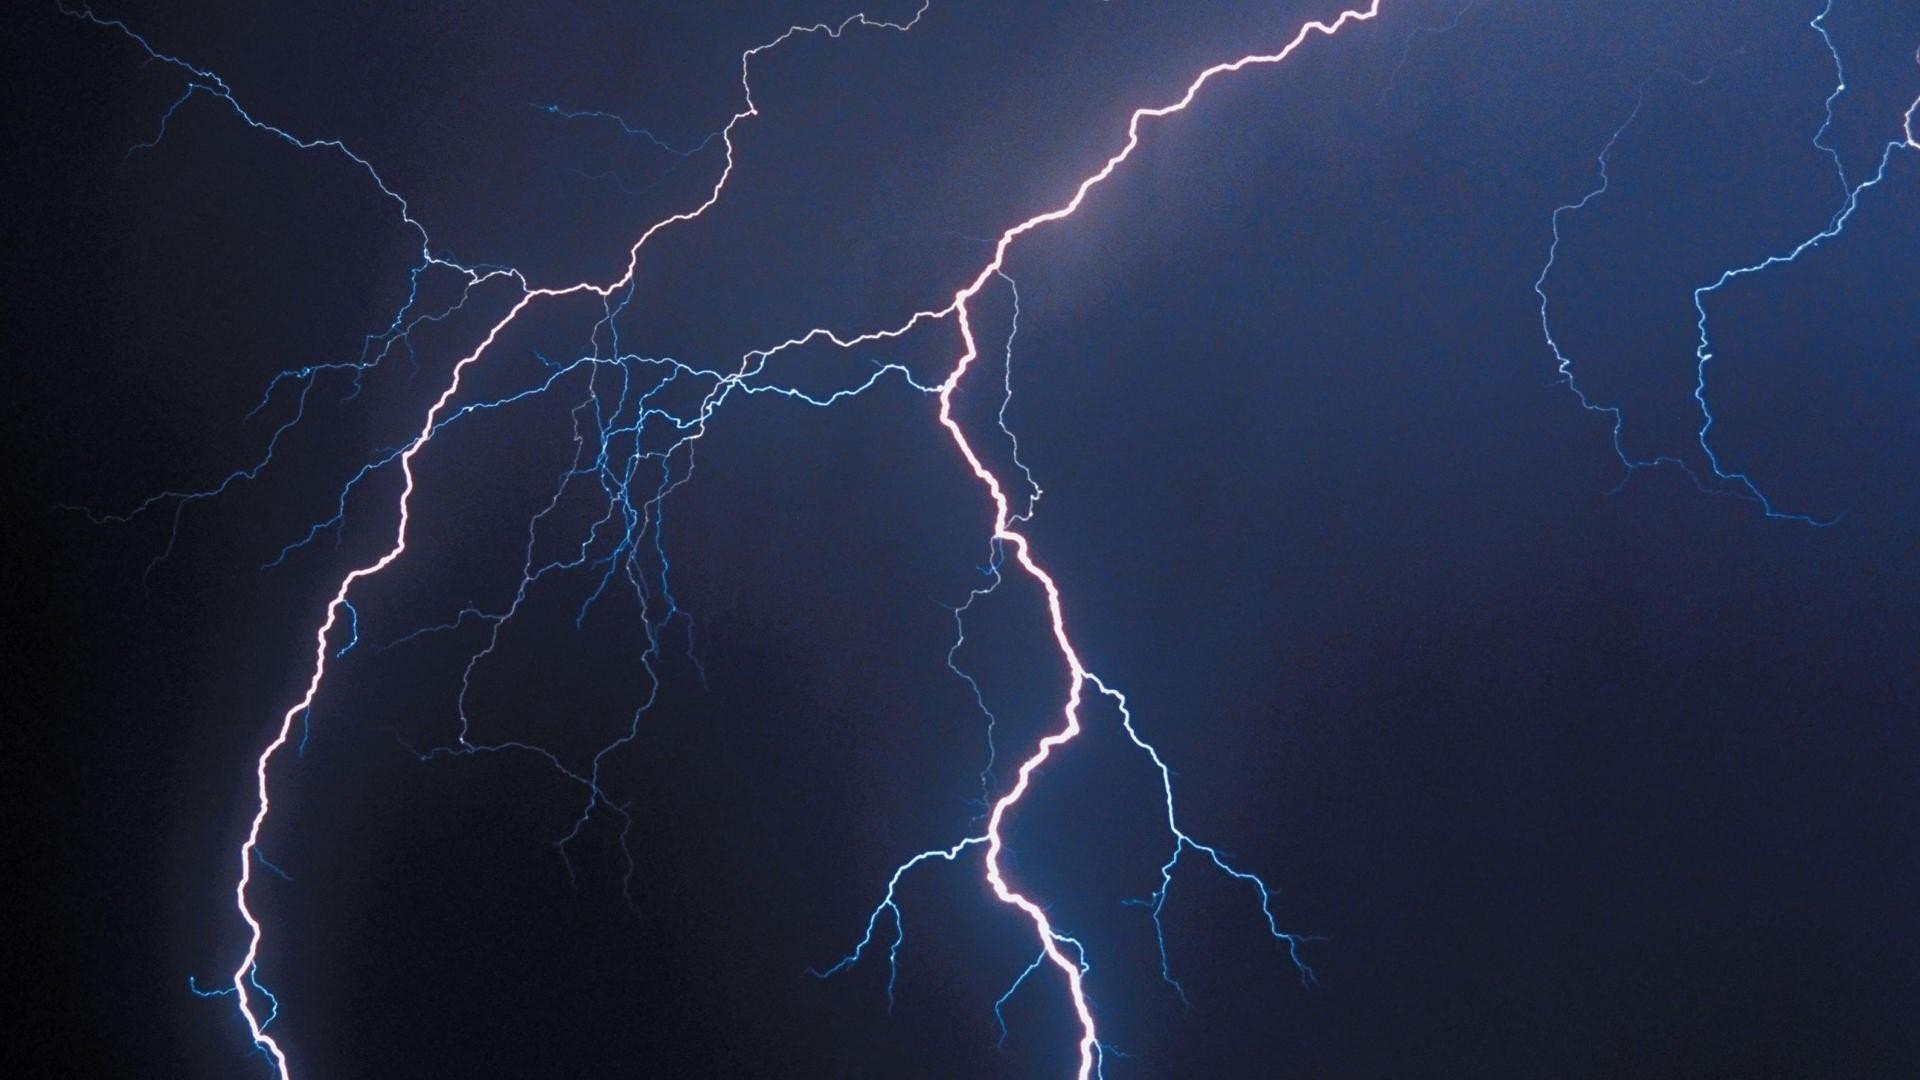 Res: 1920x1080, Lightning Fort Colorado Storm Wallpaper Nature New Hd -